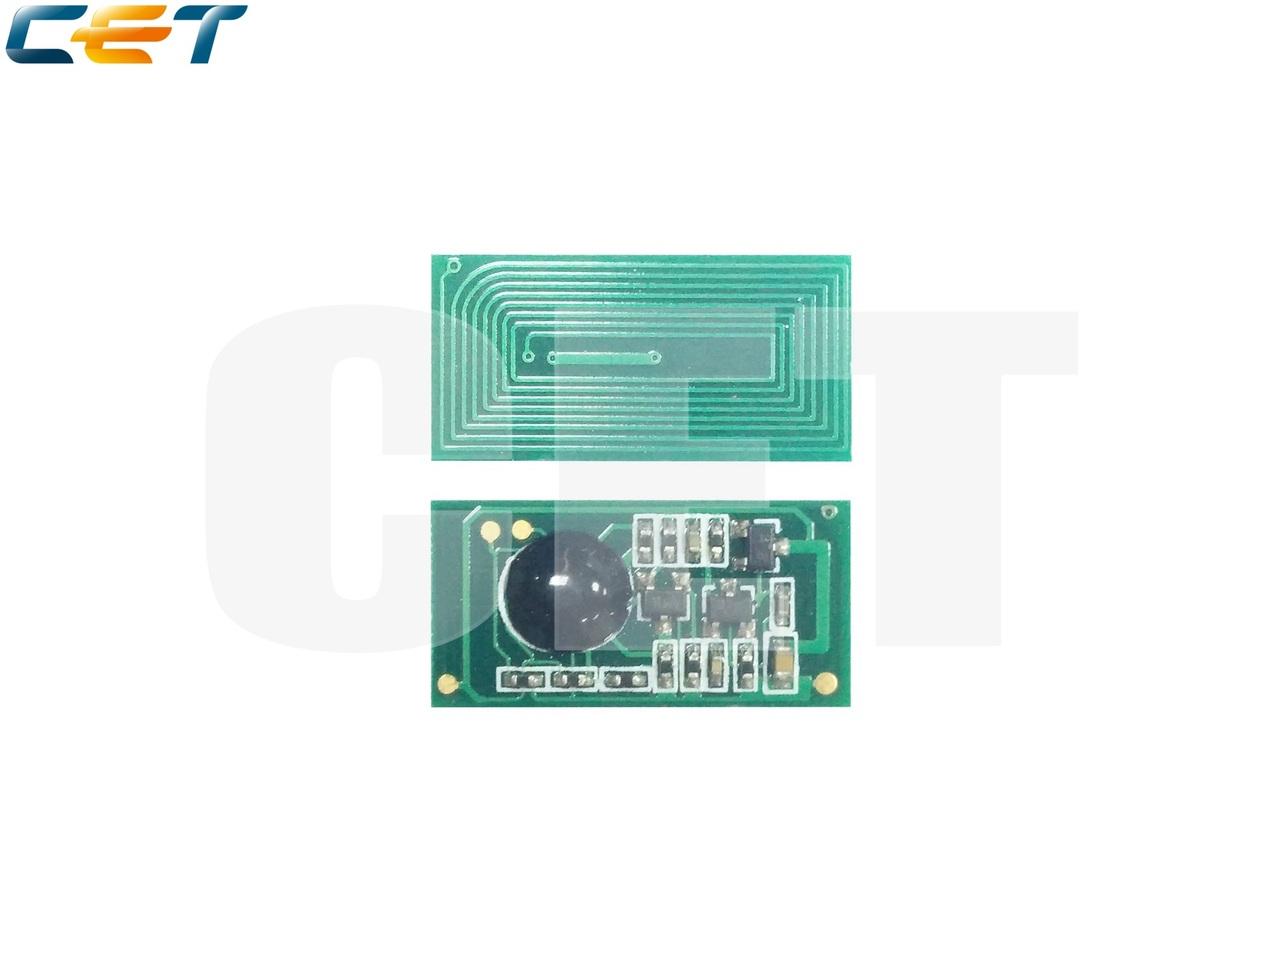 Чип картриджа для RICOH Aficio MPC2000/MPC2500/MPC3000(CET) Black, (WW), 20000 стр., CET9440K